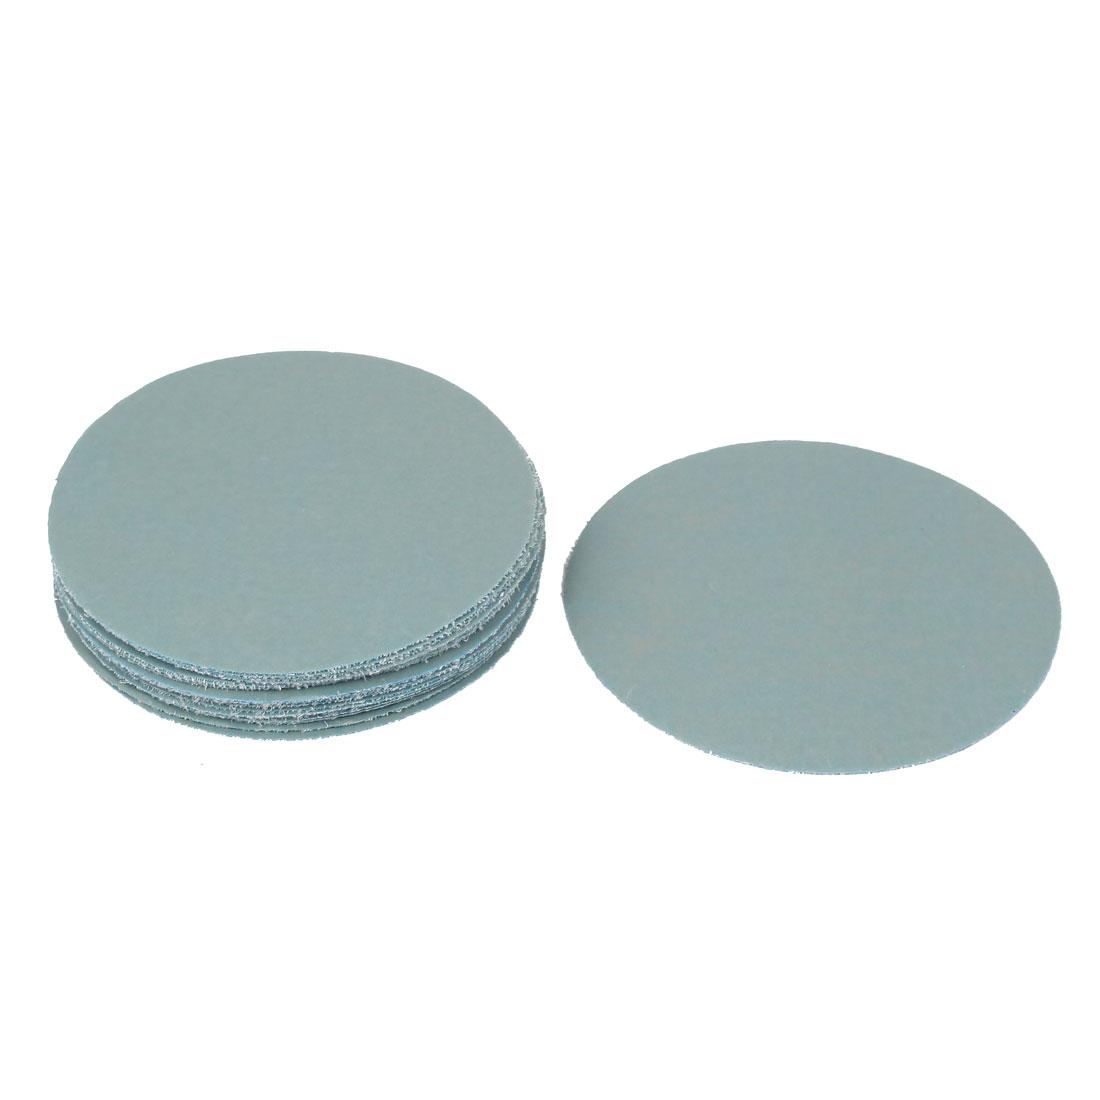 "5"" Dia Silicone Carbide Sanding Sandpaper Sheet Disc 7000 Grit 20 Pcs"